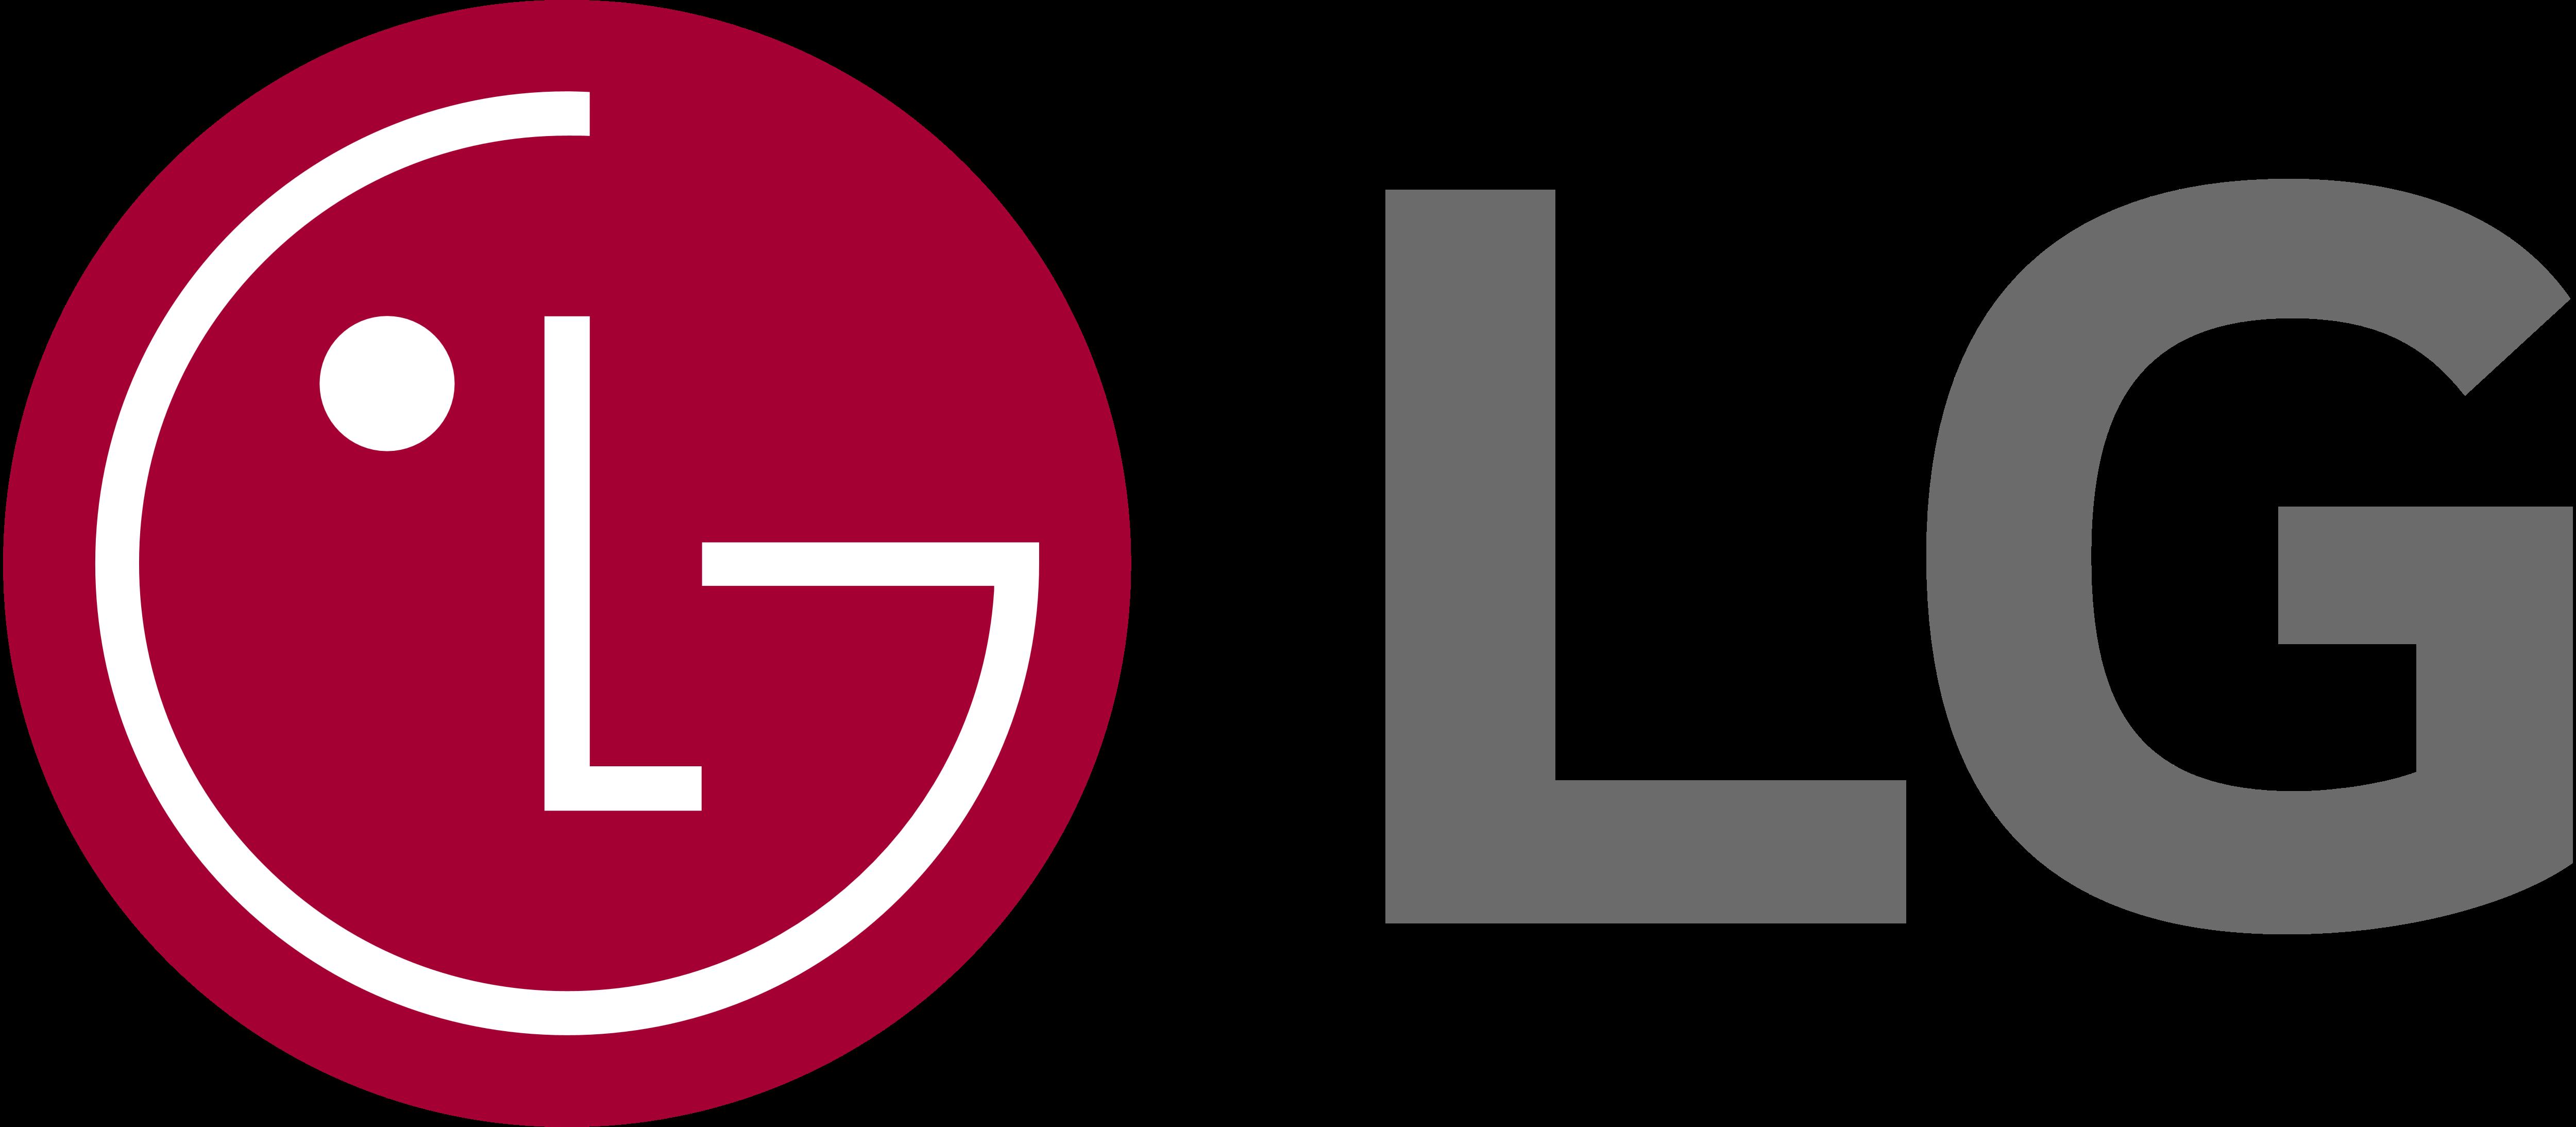 LG_logo_logotype_emblem